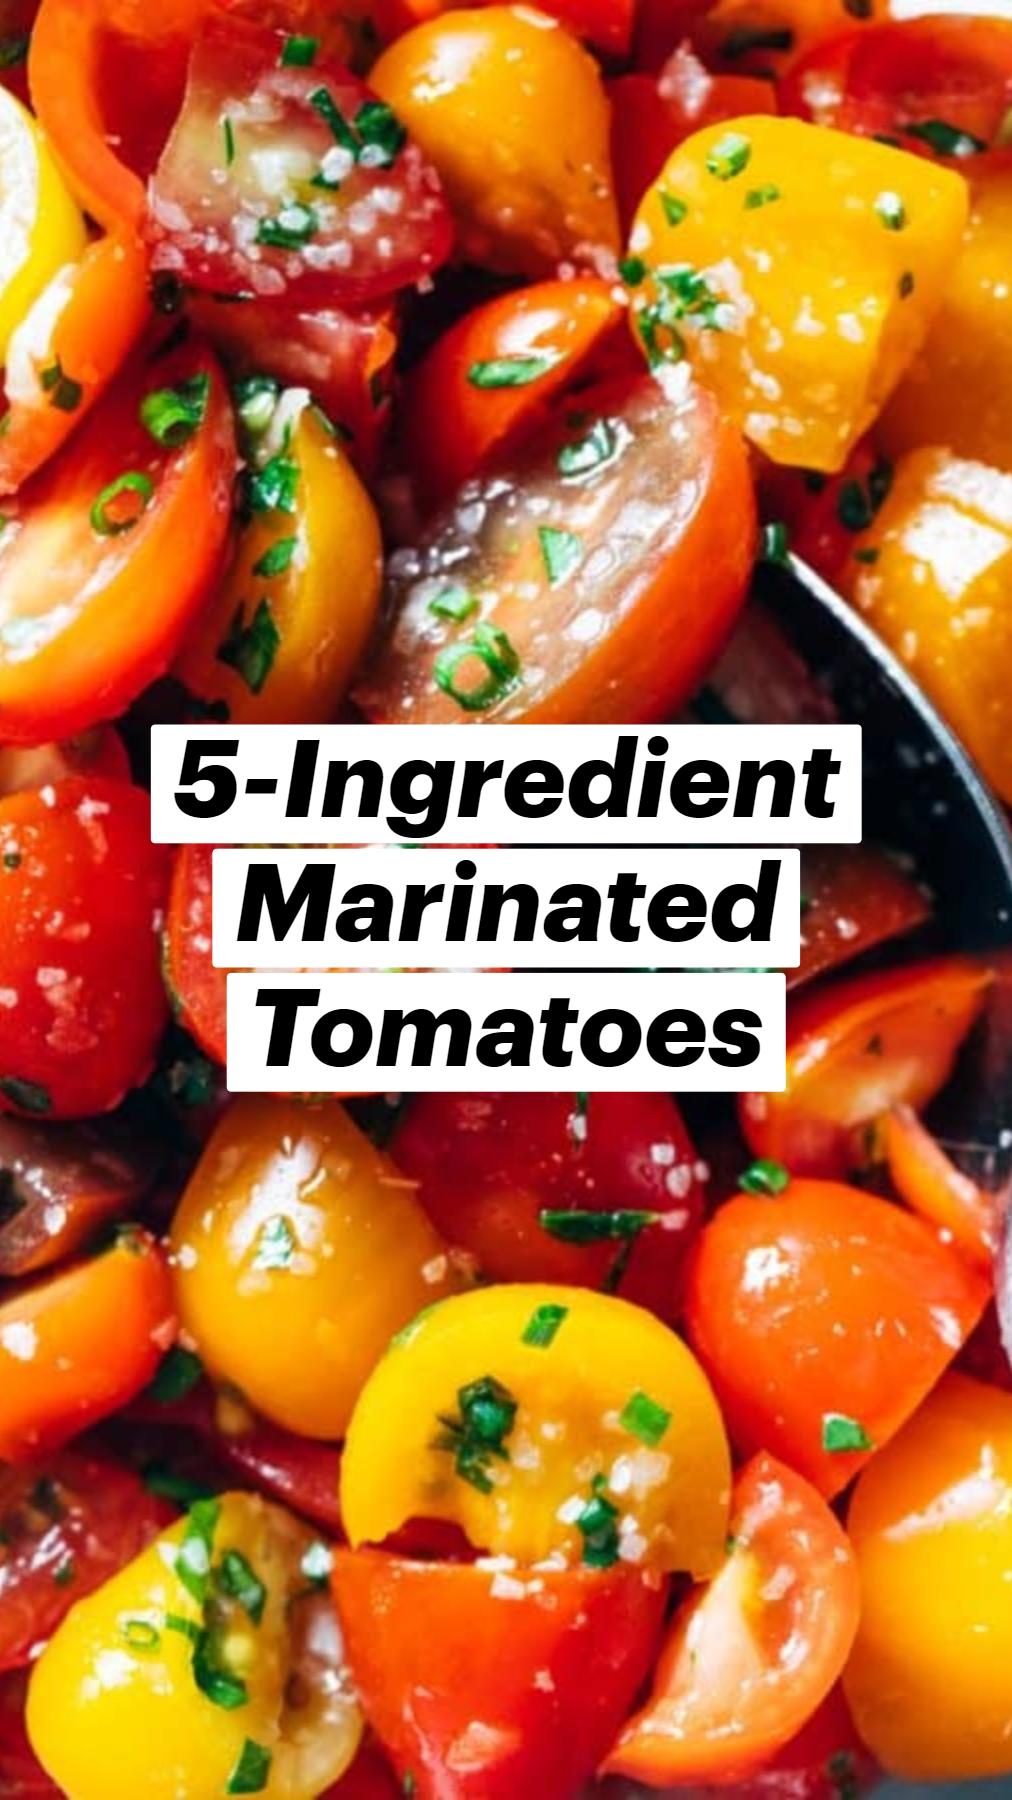 5-Ingredient Marinated Tomatoes